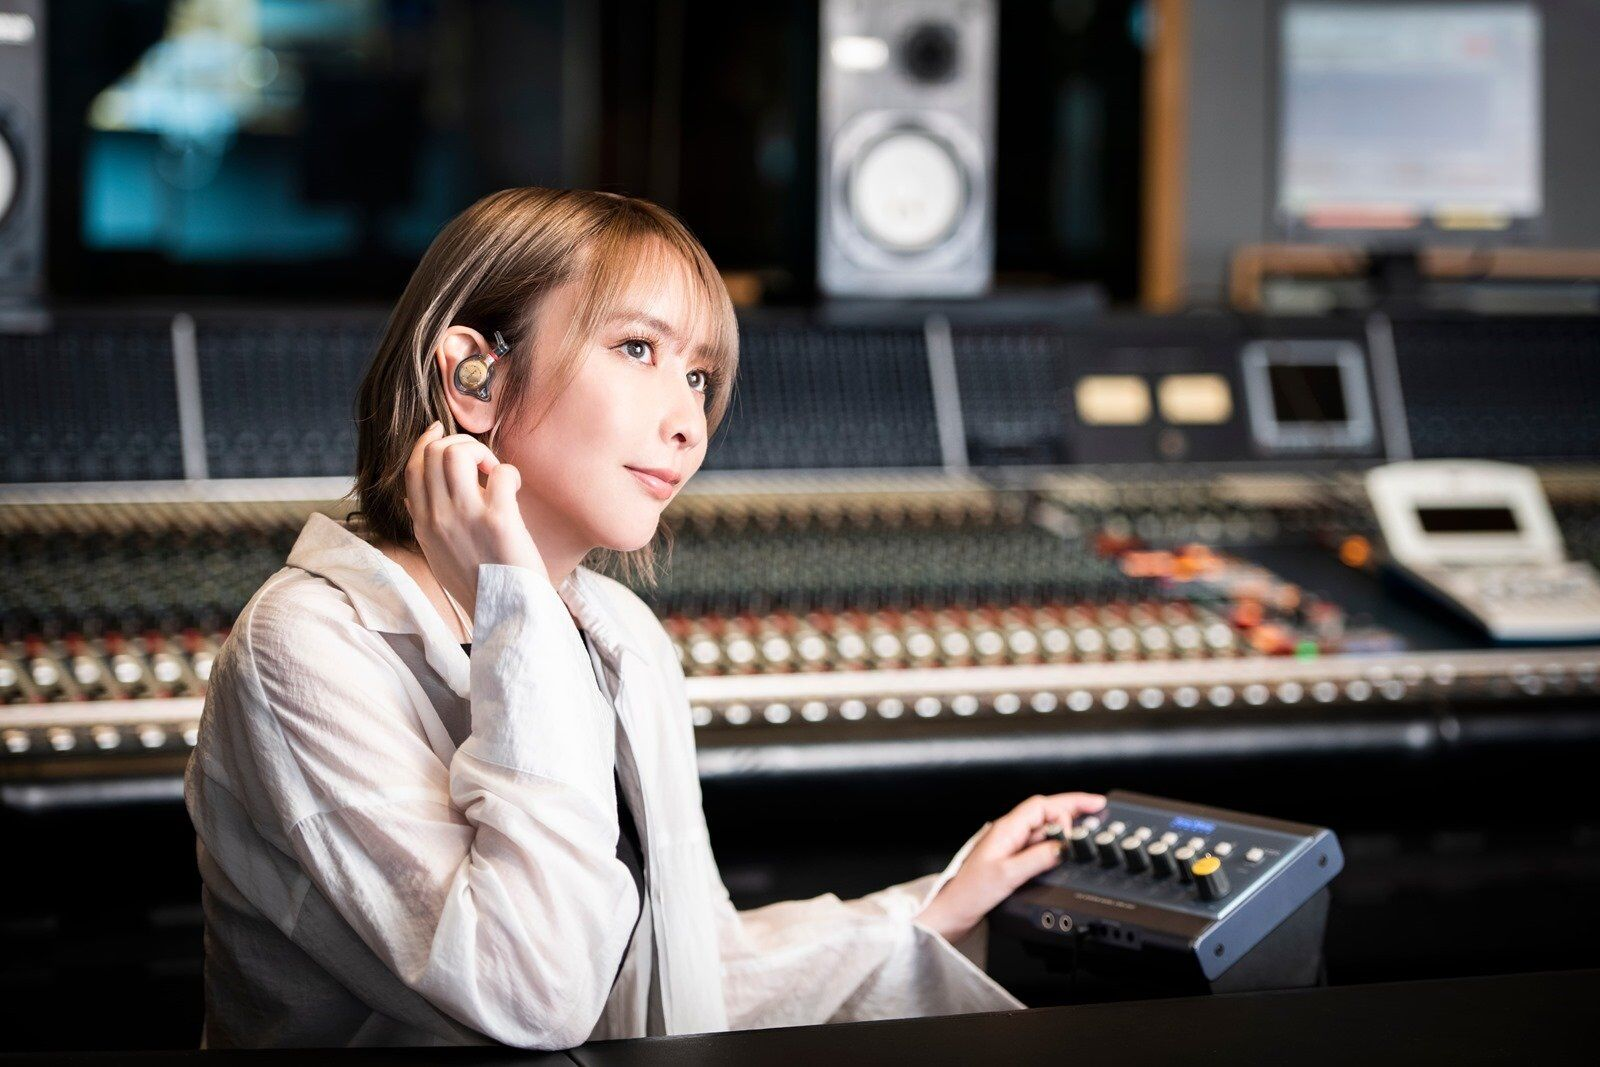 Sony 客製化入耳式耳機 Just ear 藍井艾露調音版 XJE-MHREIR「Always connected」享受高音質的音樂連結 @3C 達人廖阿輝